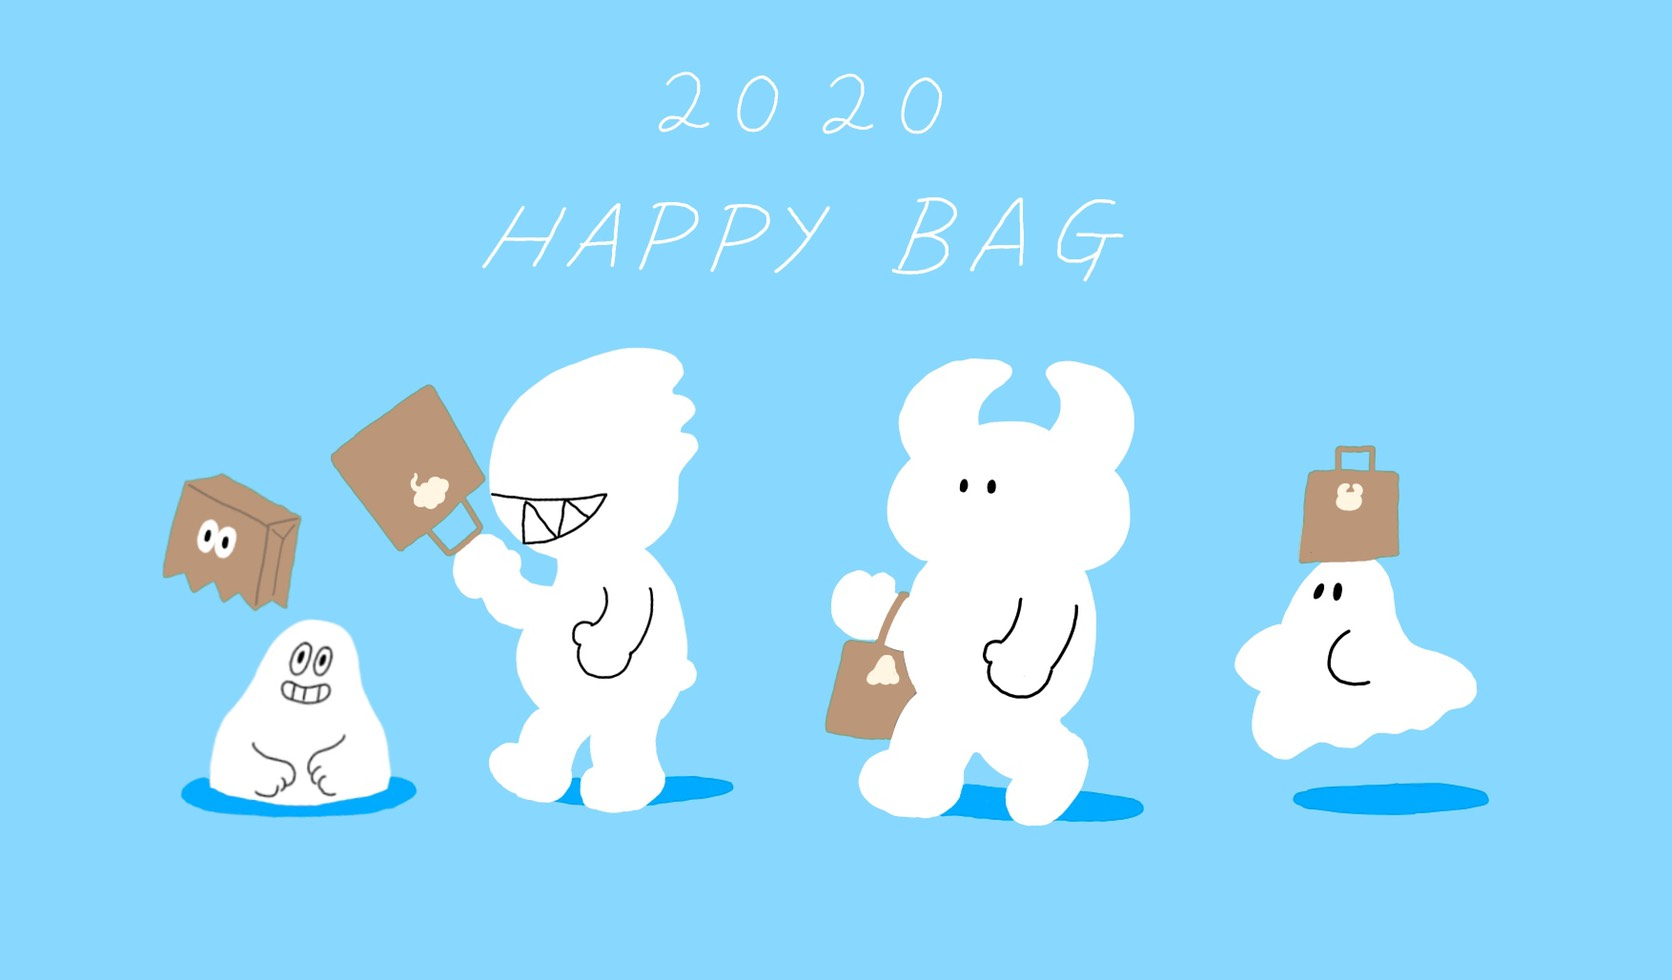 happybag_2020